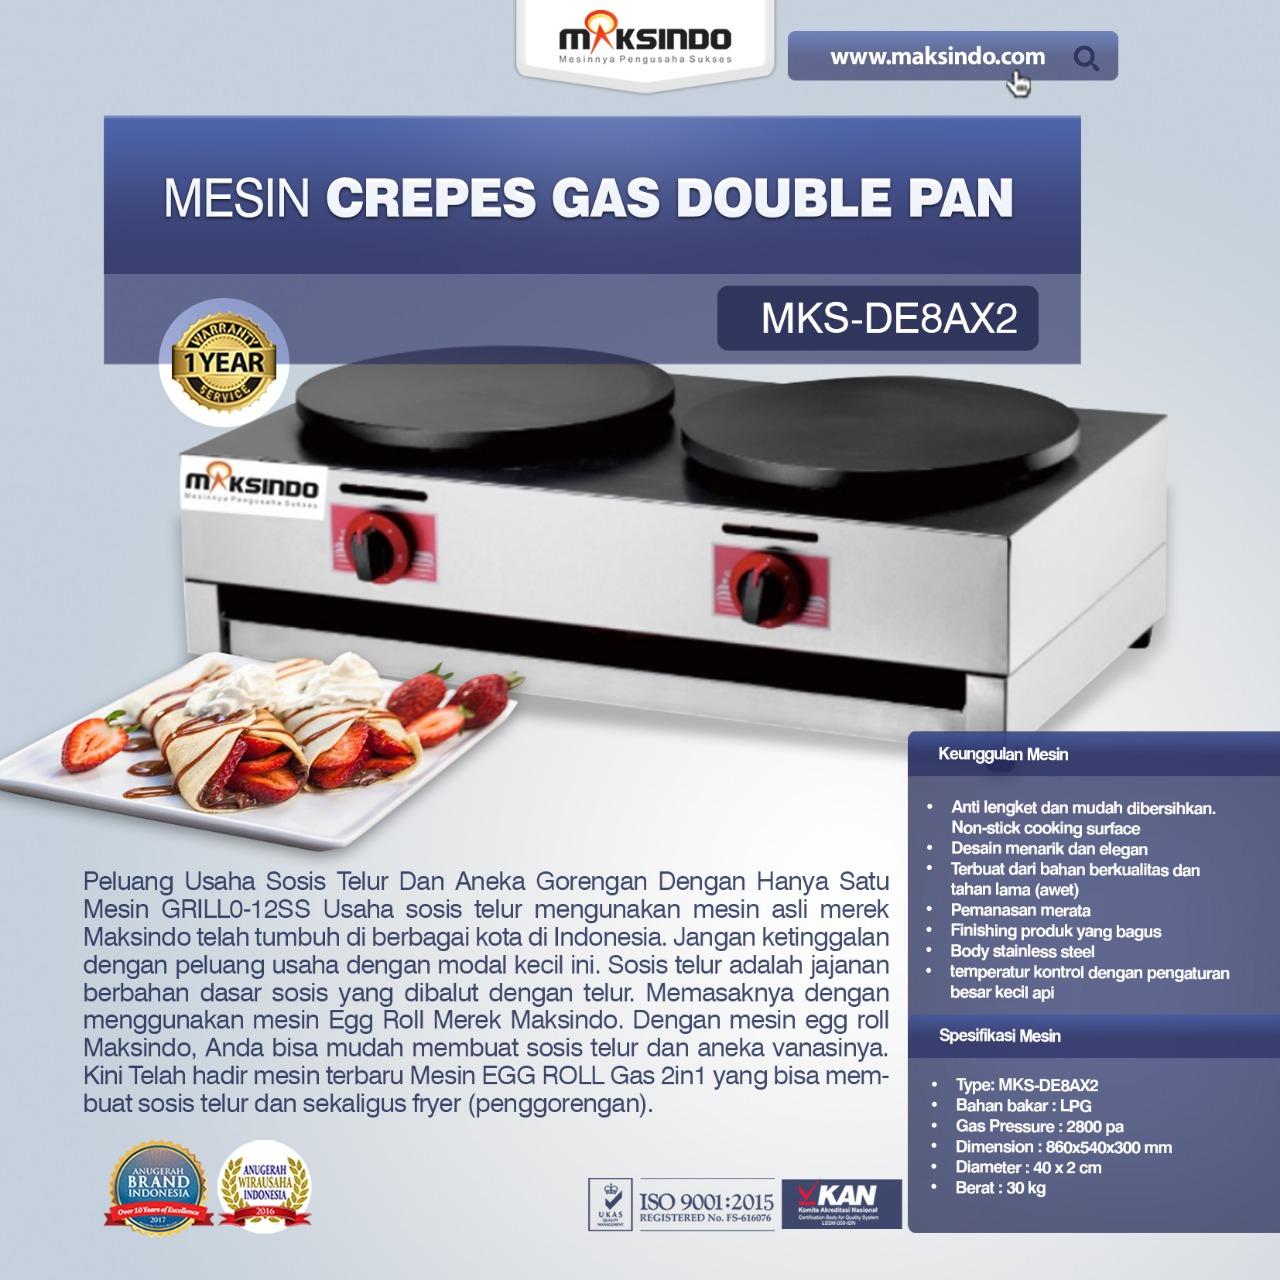 Jual Mesin Crepes Gas Double Pan (DE8Ax2) di Tangerang